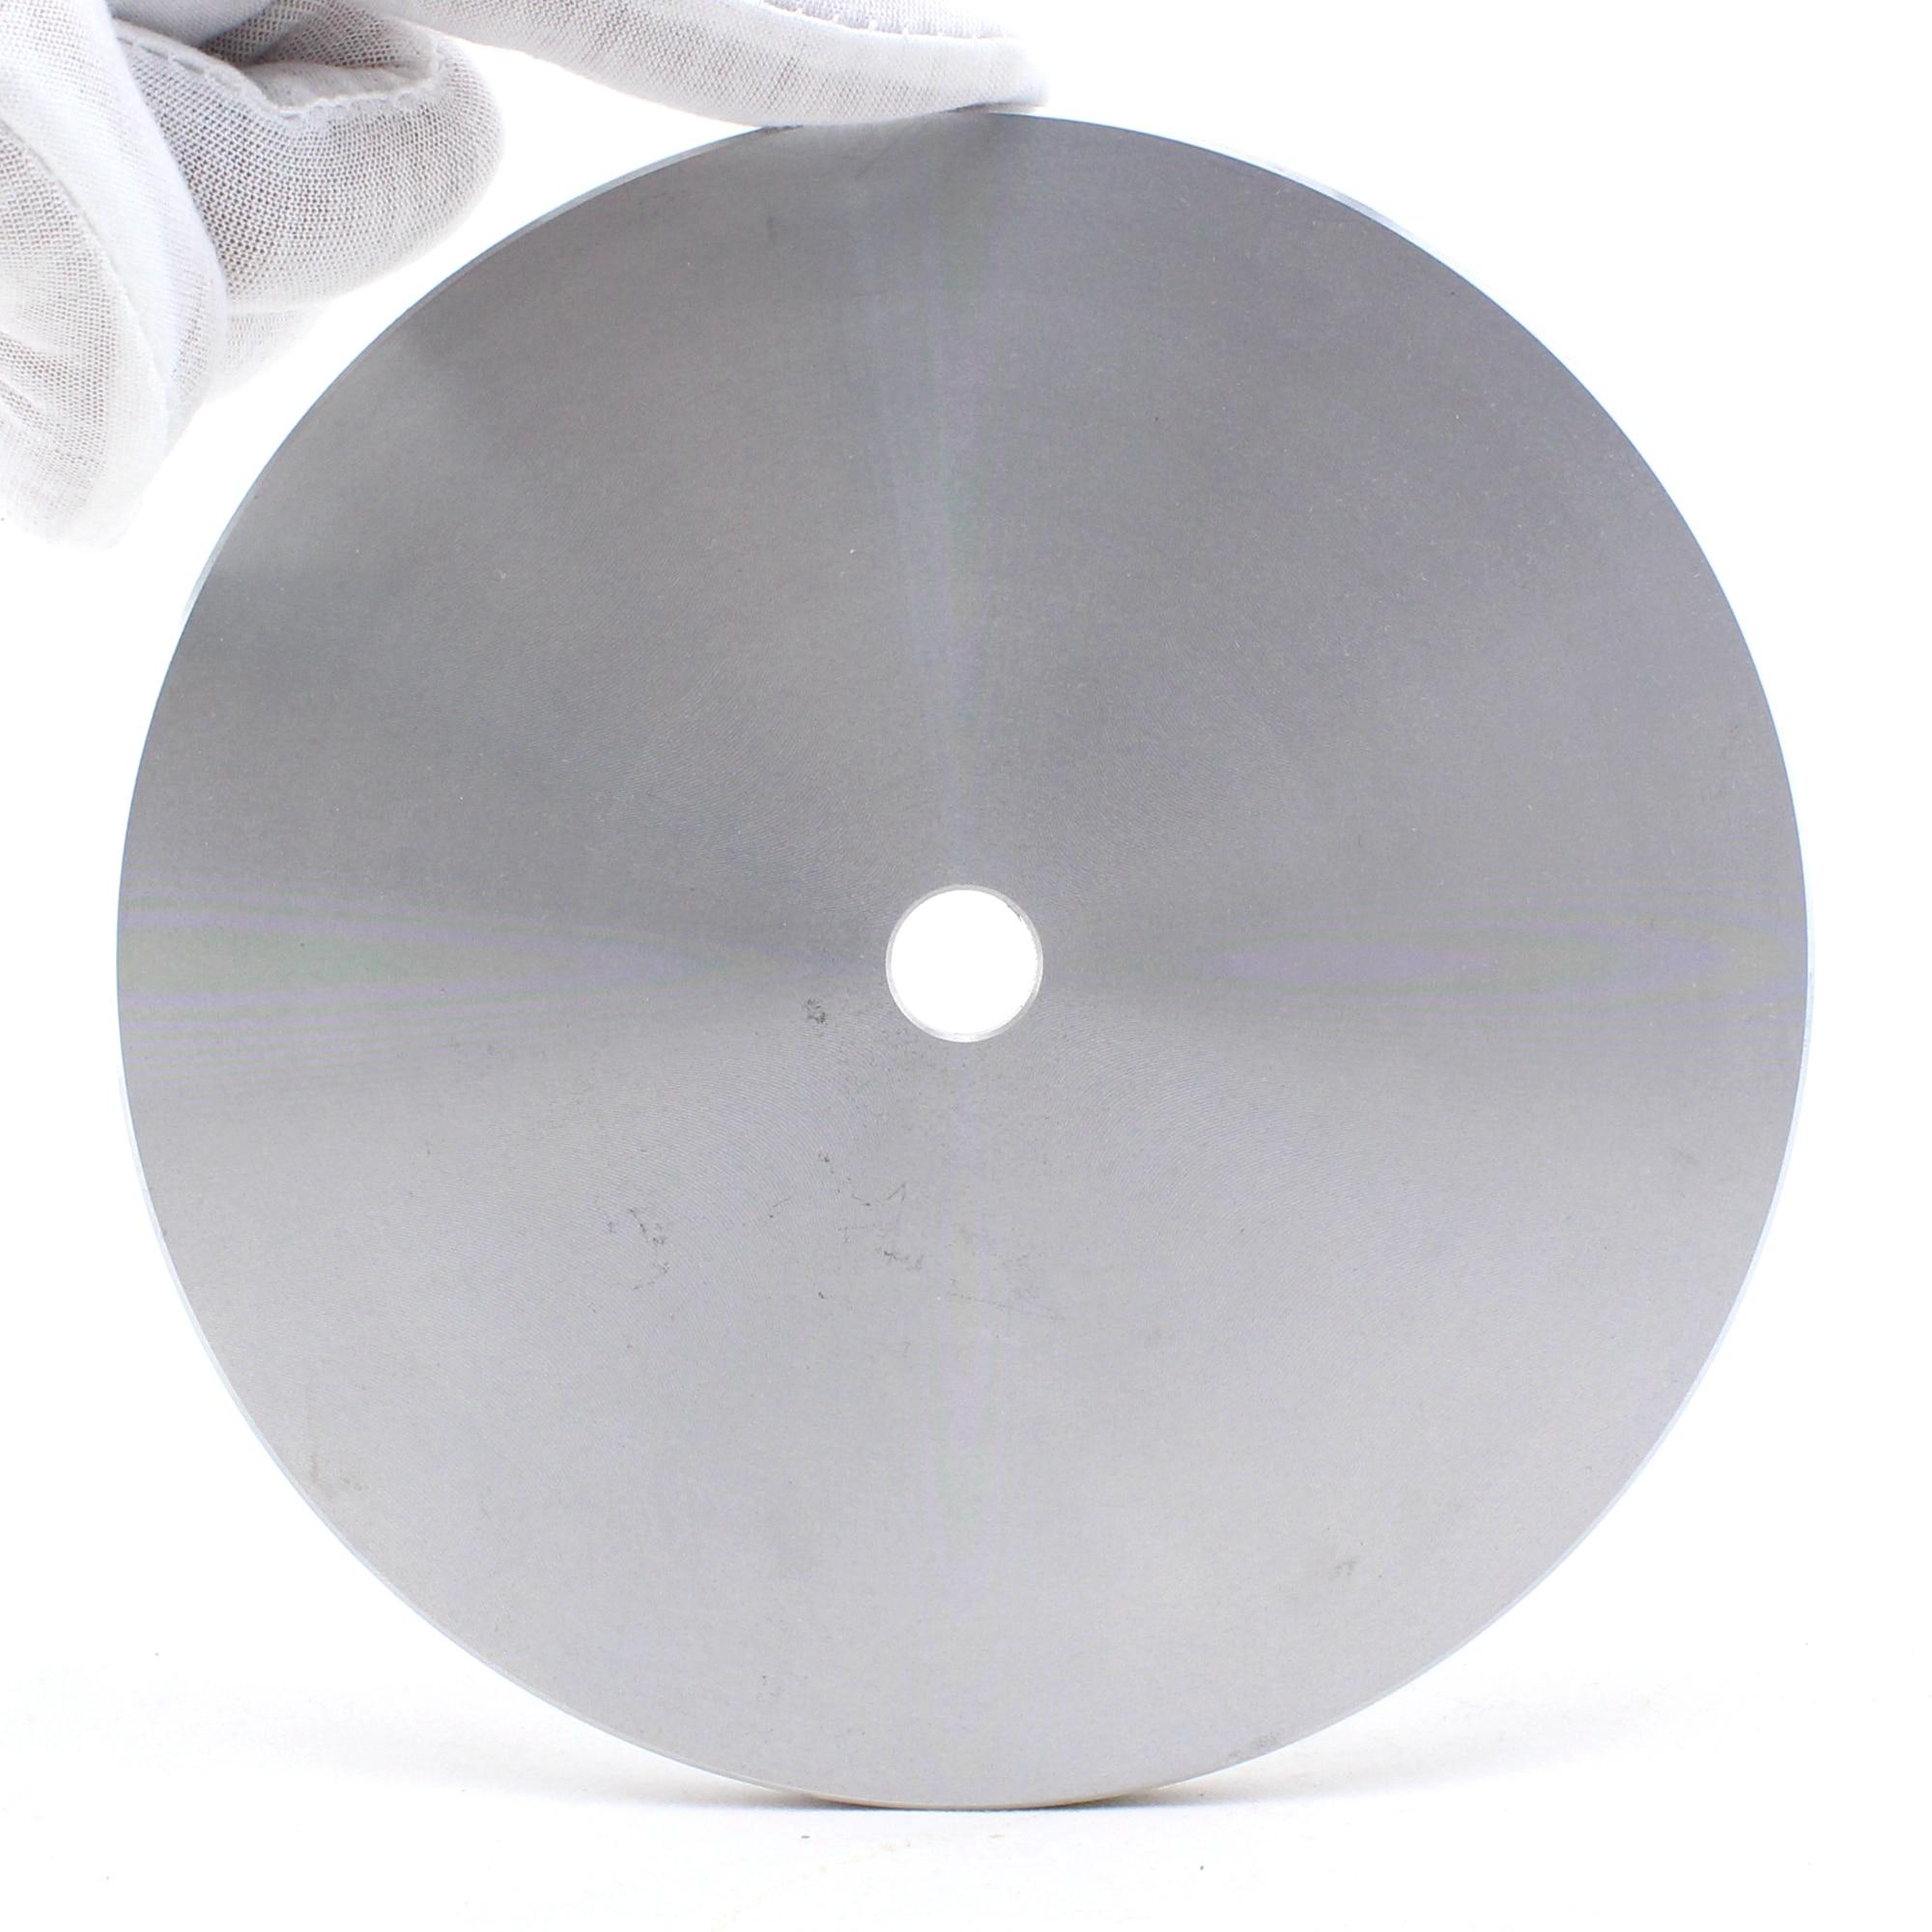 8 inch 200mm Aluminum Master Lap for Diamond coated Flat Lap Disk Grinding ILOVETOOL 6 inch lapidary concave arc diamond coated grinding wheel grind spherical 6 mm ilovetool